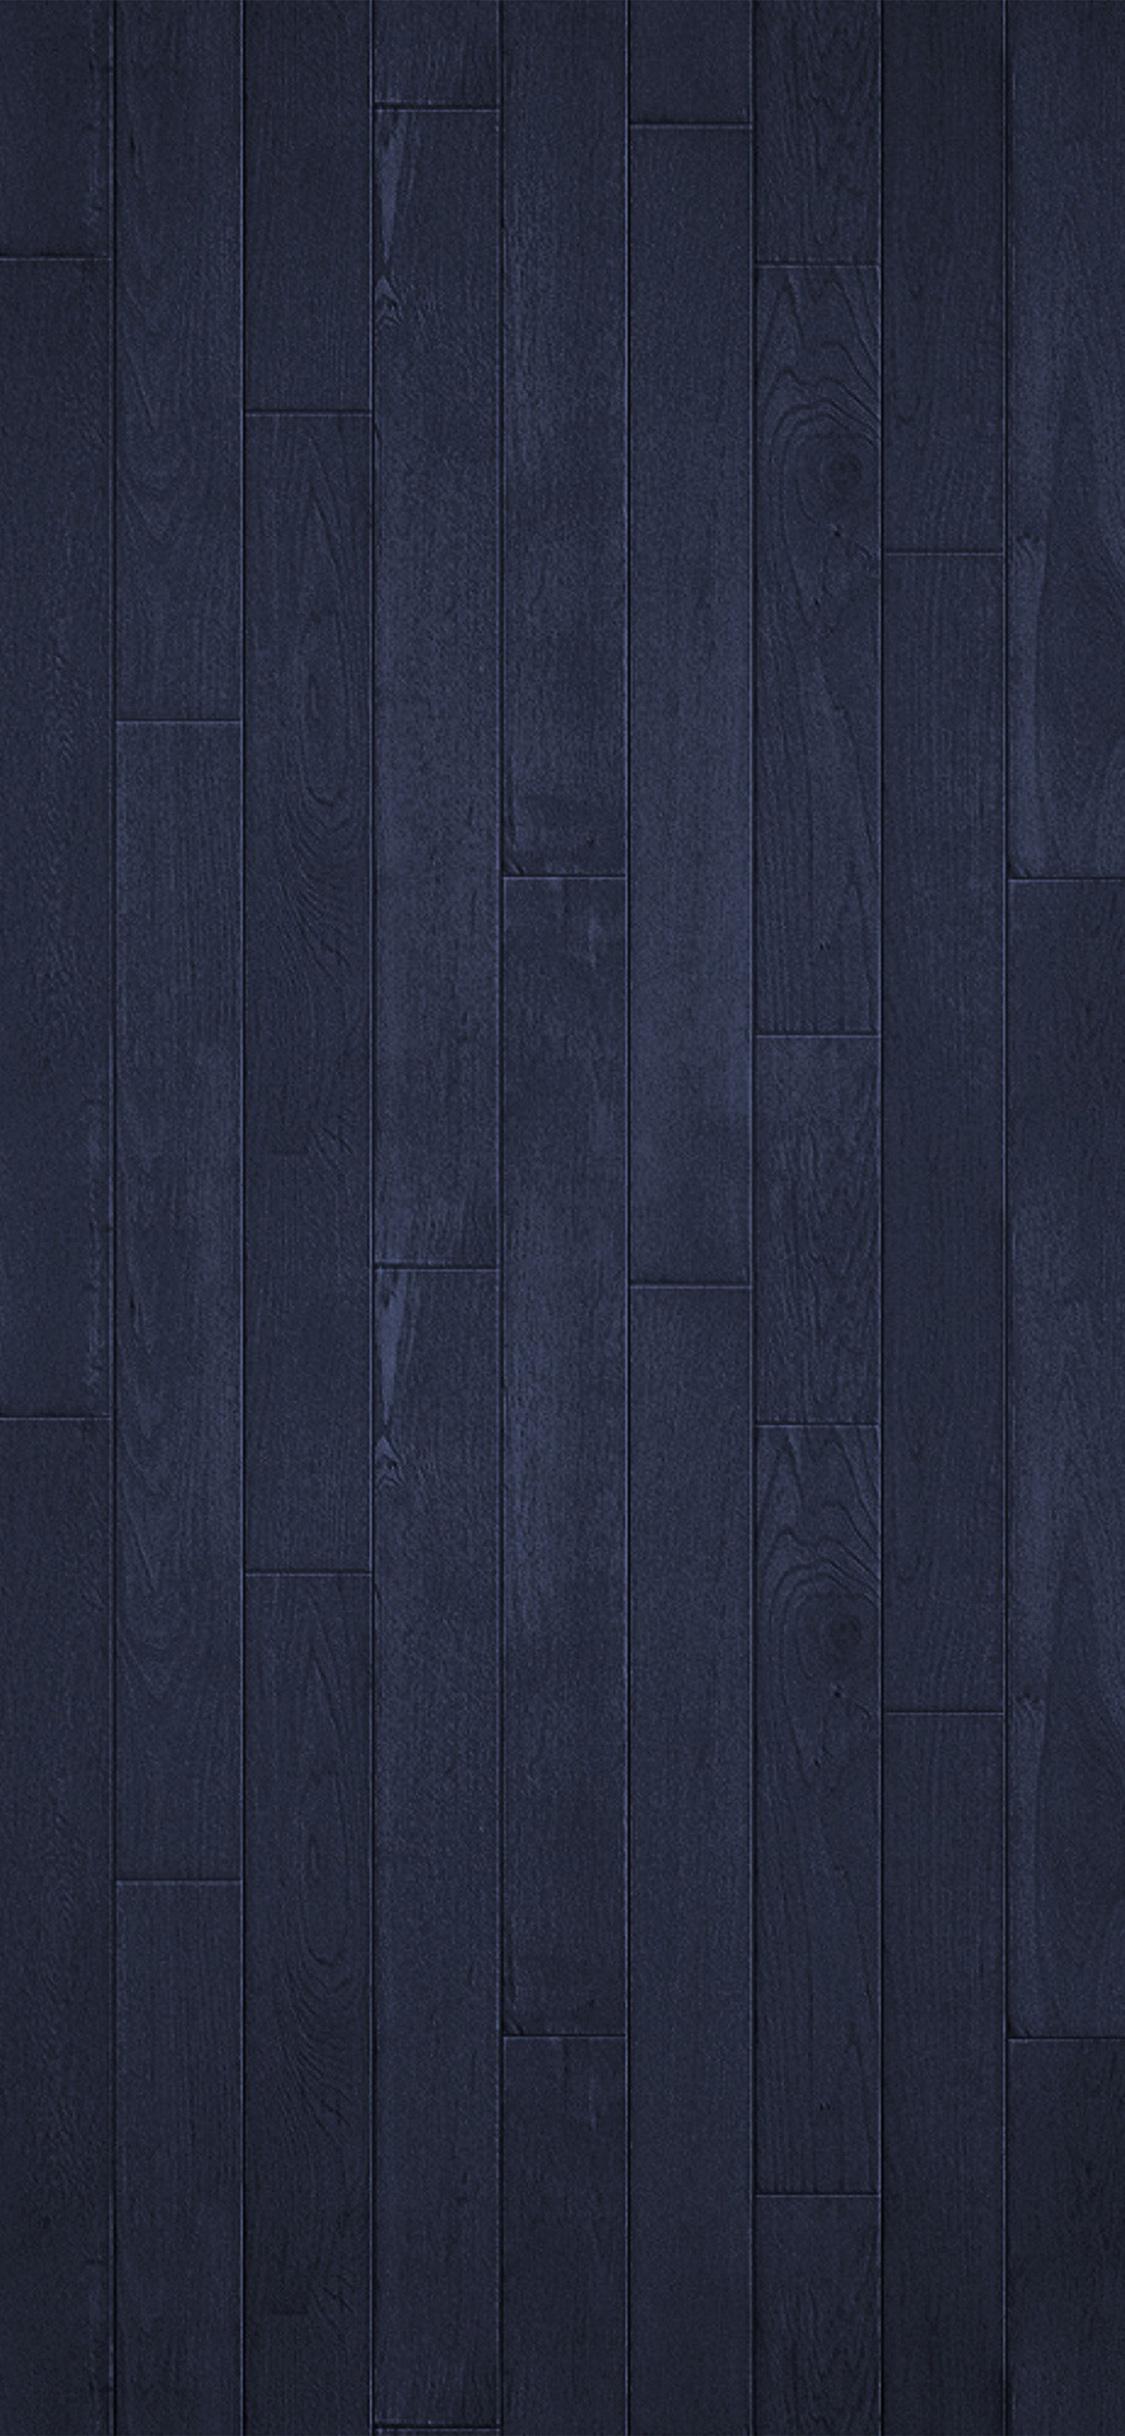 Wood Iphone 5 Wallpaper Vt88 Texture Blue Wood Dark Nature Pattern Wallpaper